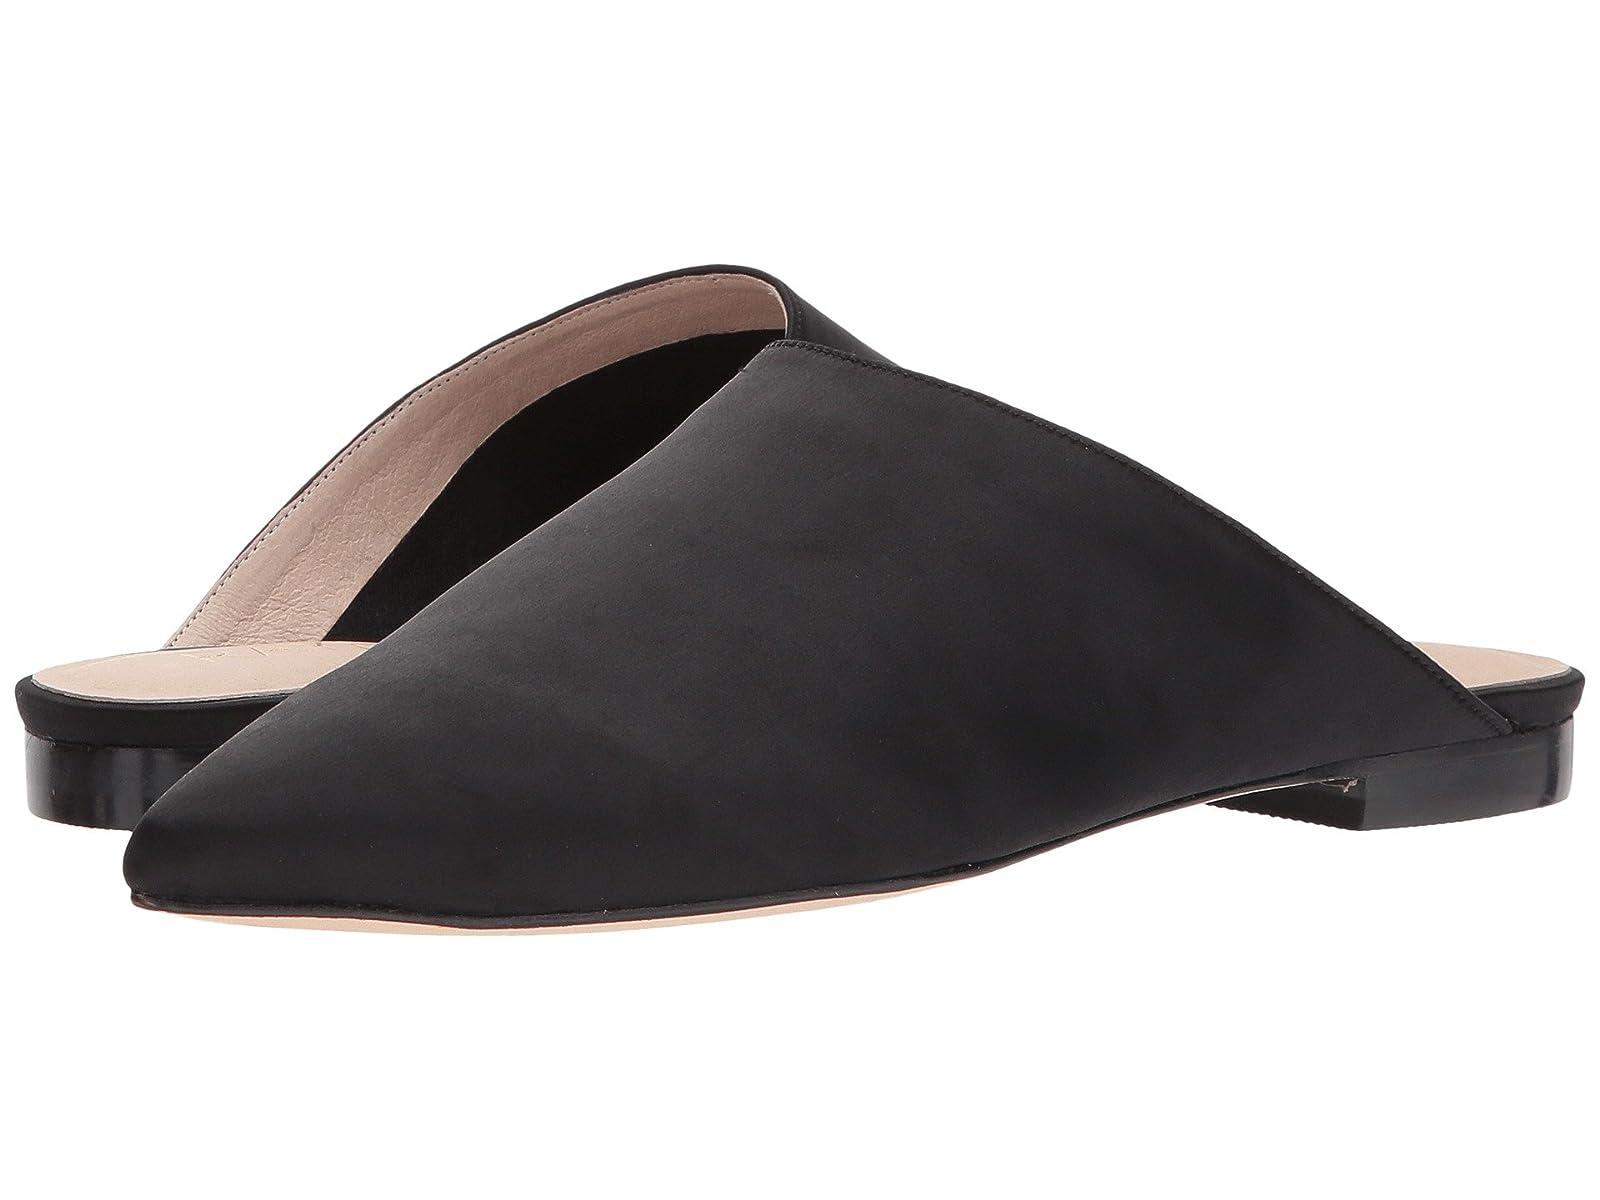 RAYE JaggerCheap and distinctive eye-catching shoes